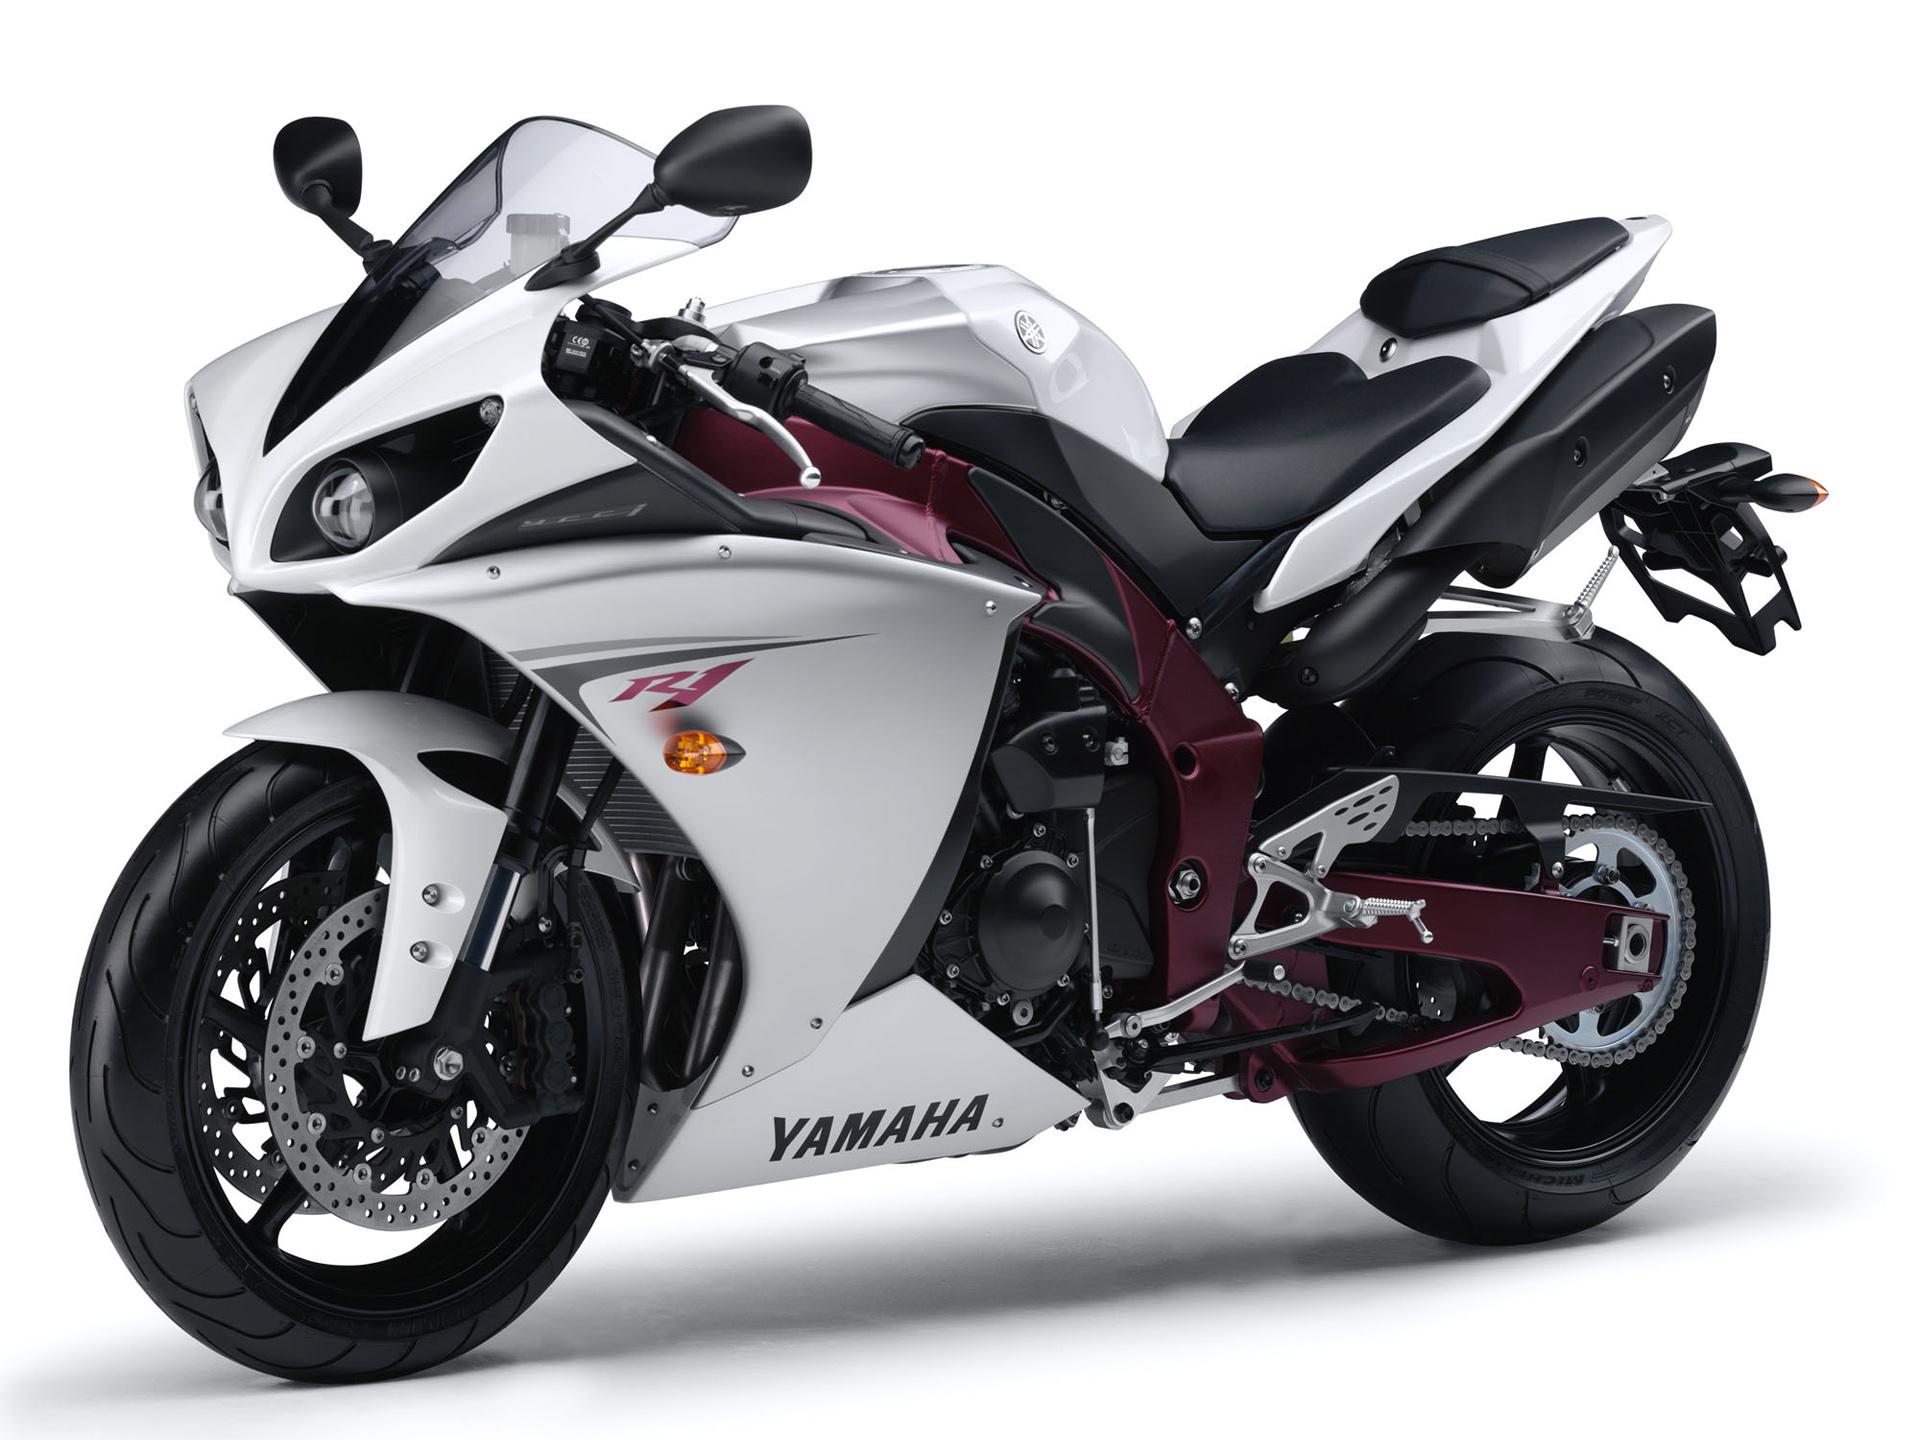 Yamaha yzf r1 picture 63600 yamaha photo gallery for Yzf r1 yamaha